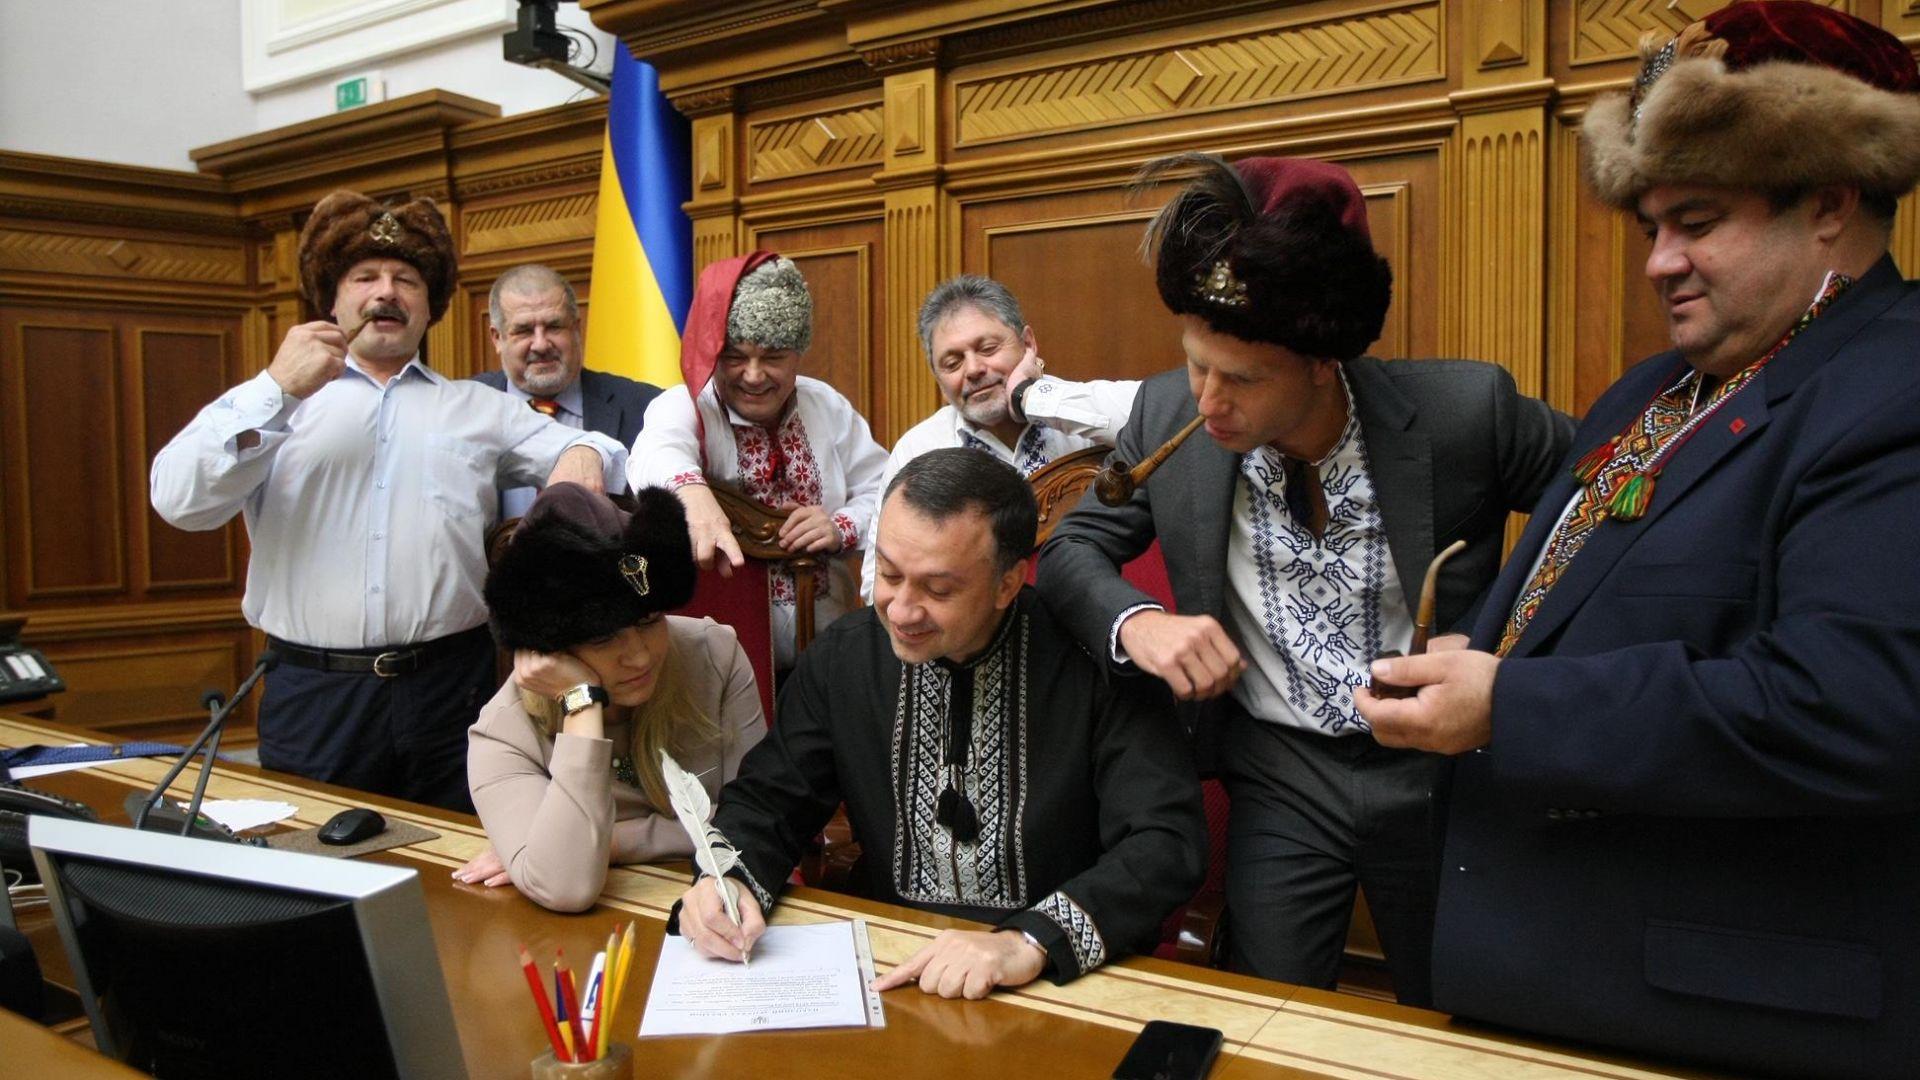 Украински депутати се преобразиха на казаци и написаха писмо до Путин